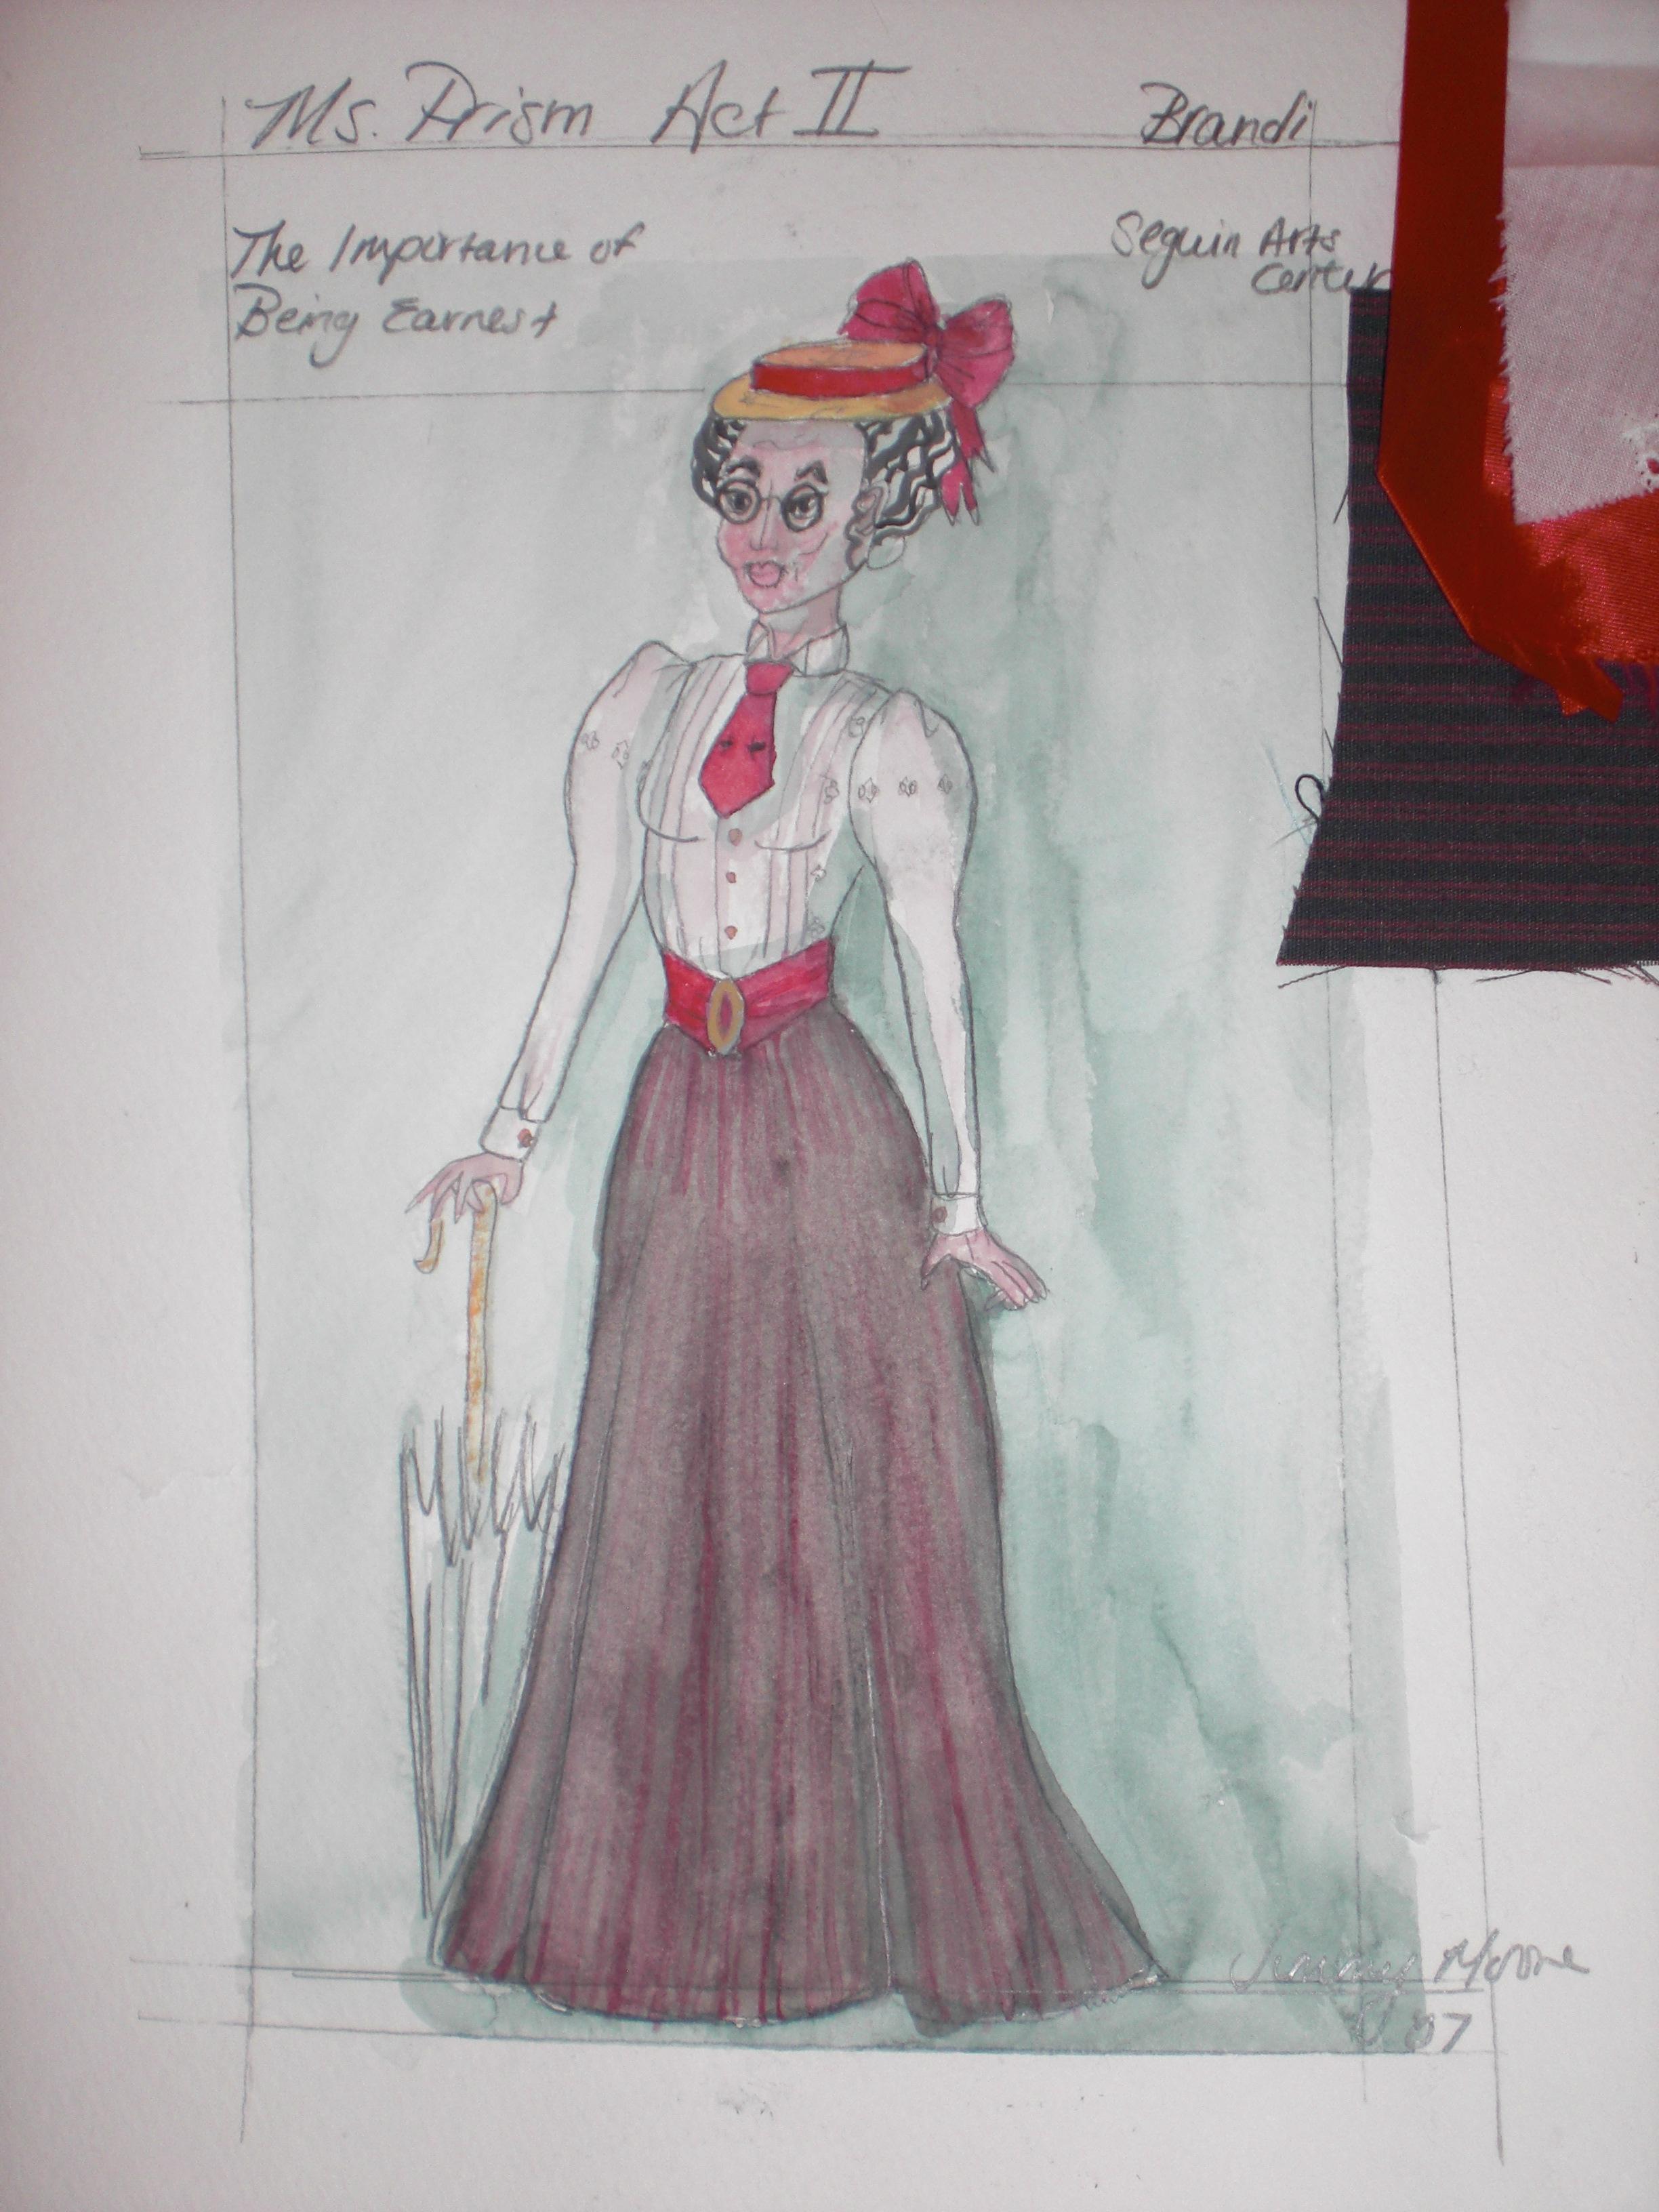 Miss Prism